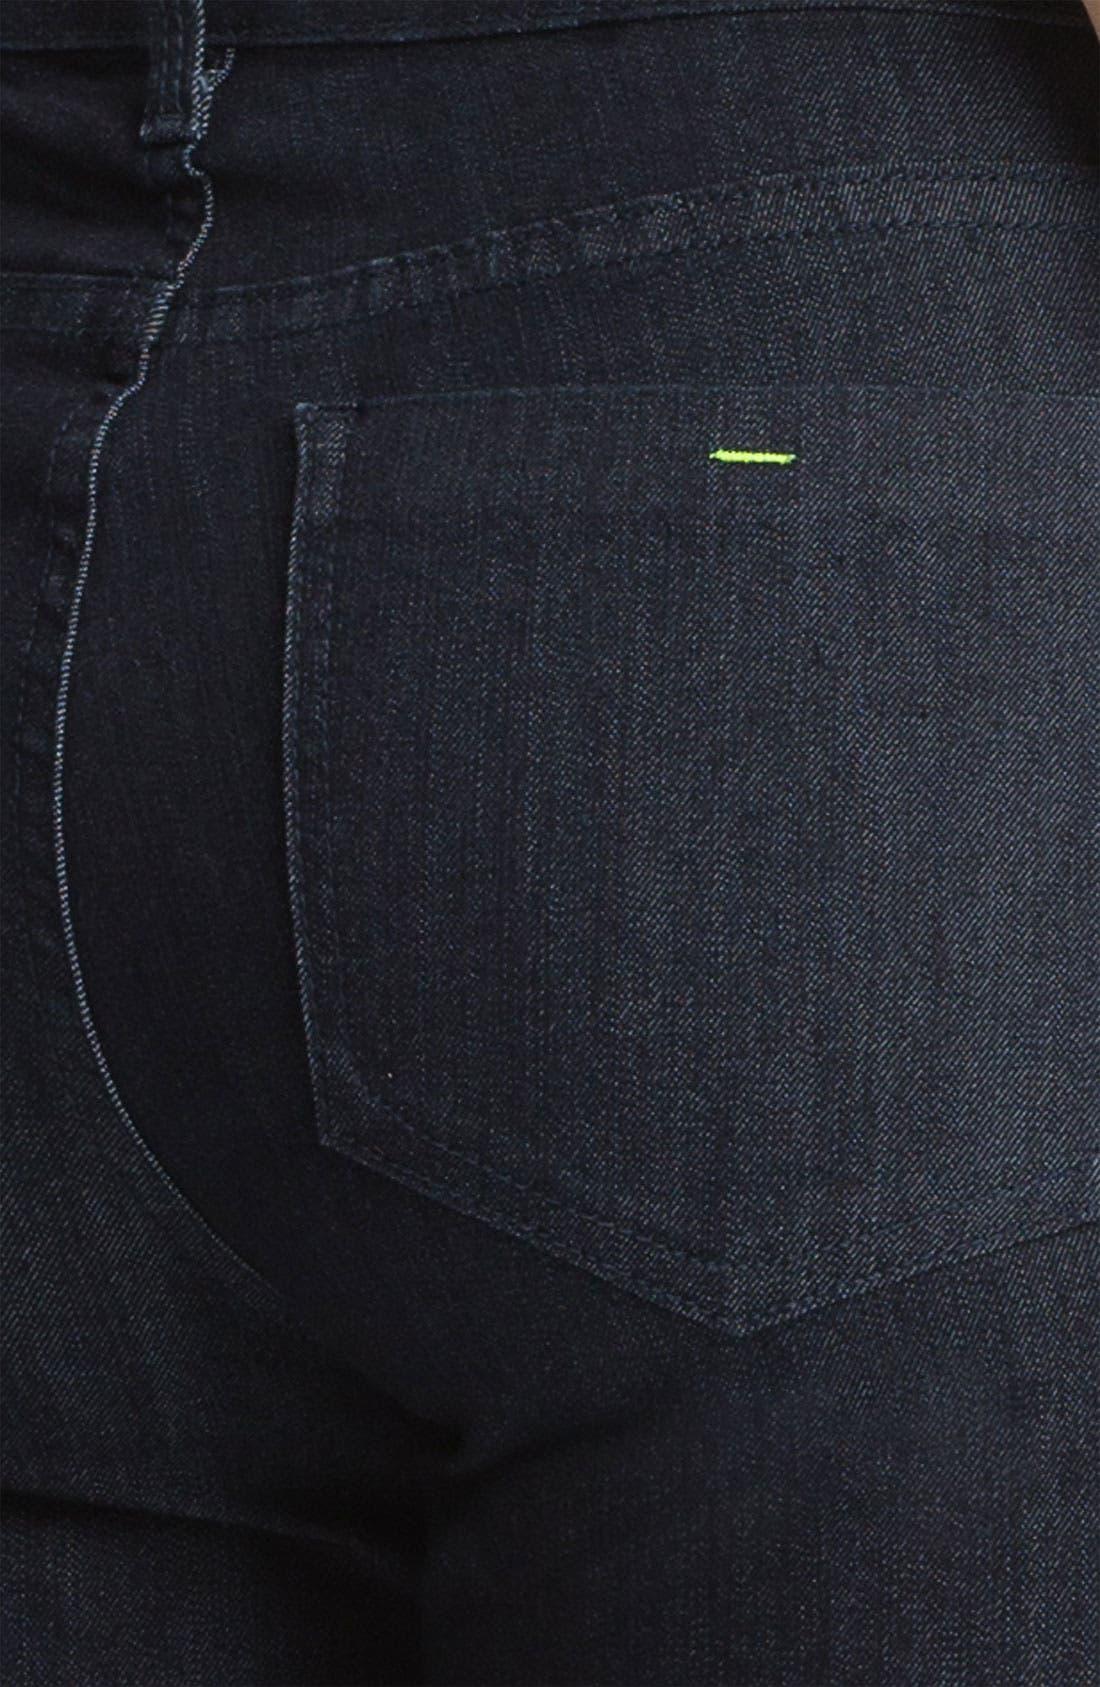 Alternate Image 3  - NYDJ 'Sheri' Neon Stitch Skinny Stretch Jeans